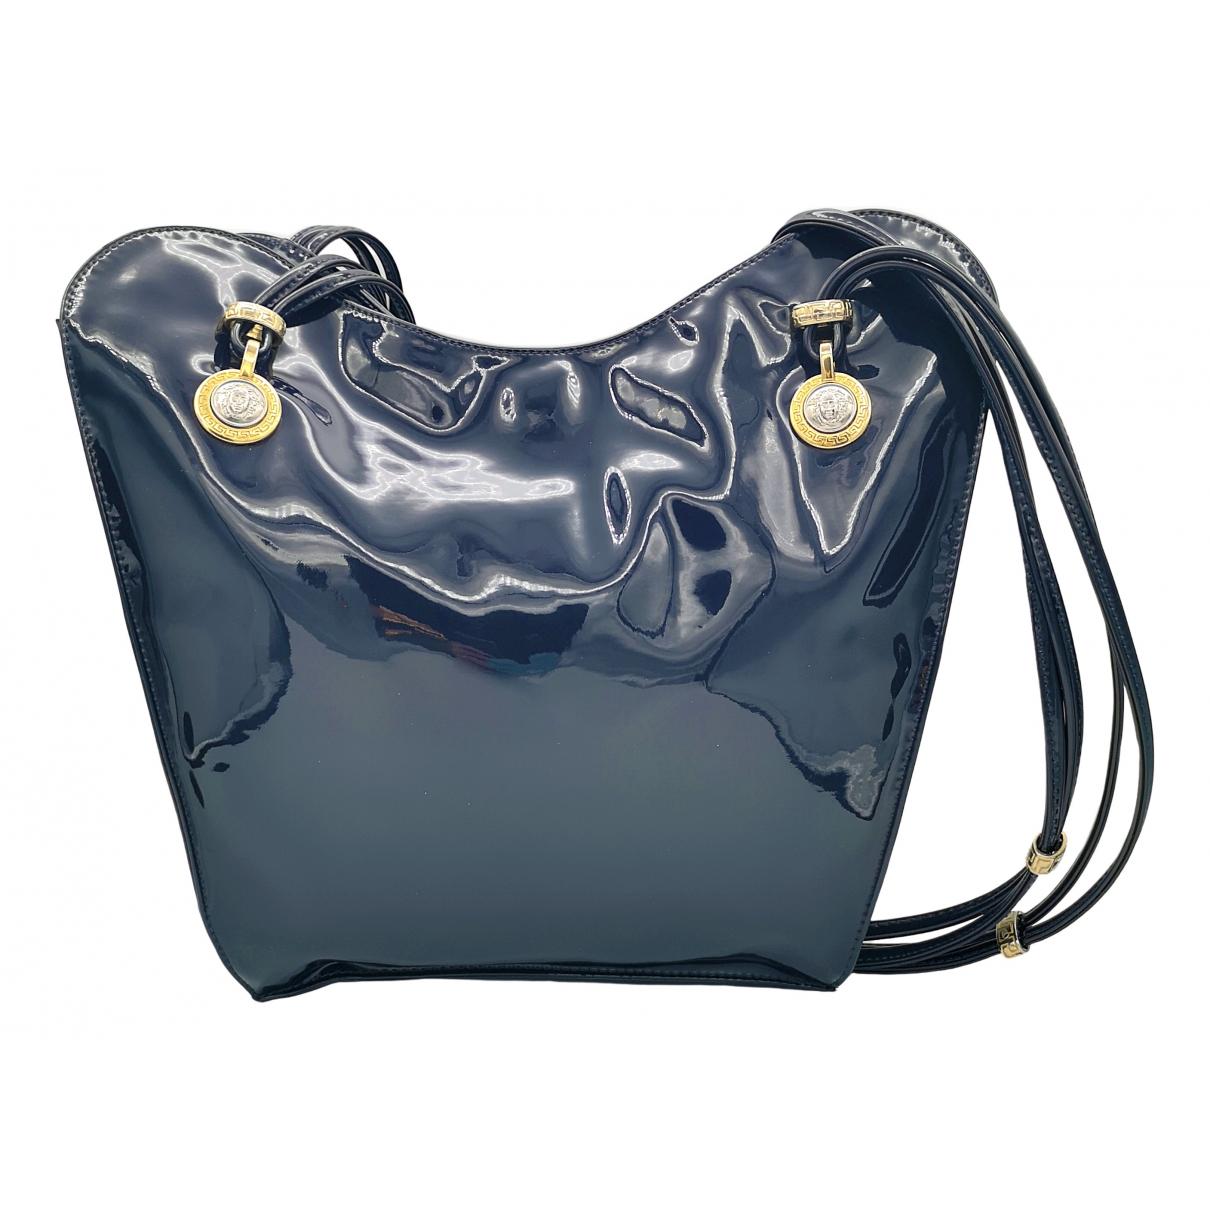 Gianni Versace \N Blue Patent leather handbag for Women \N